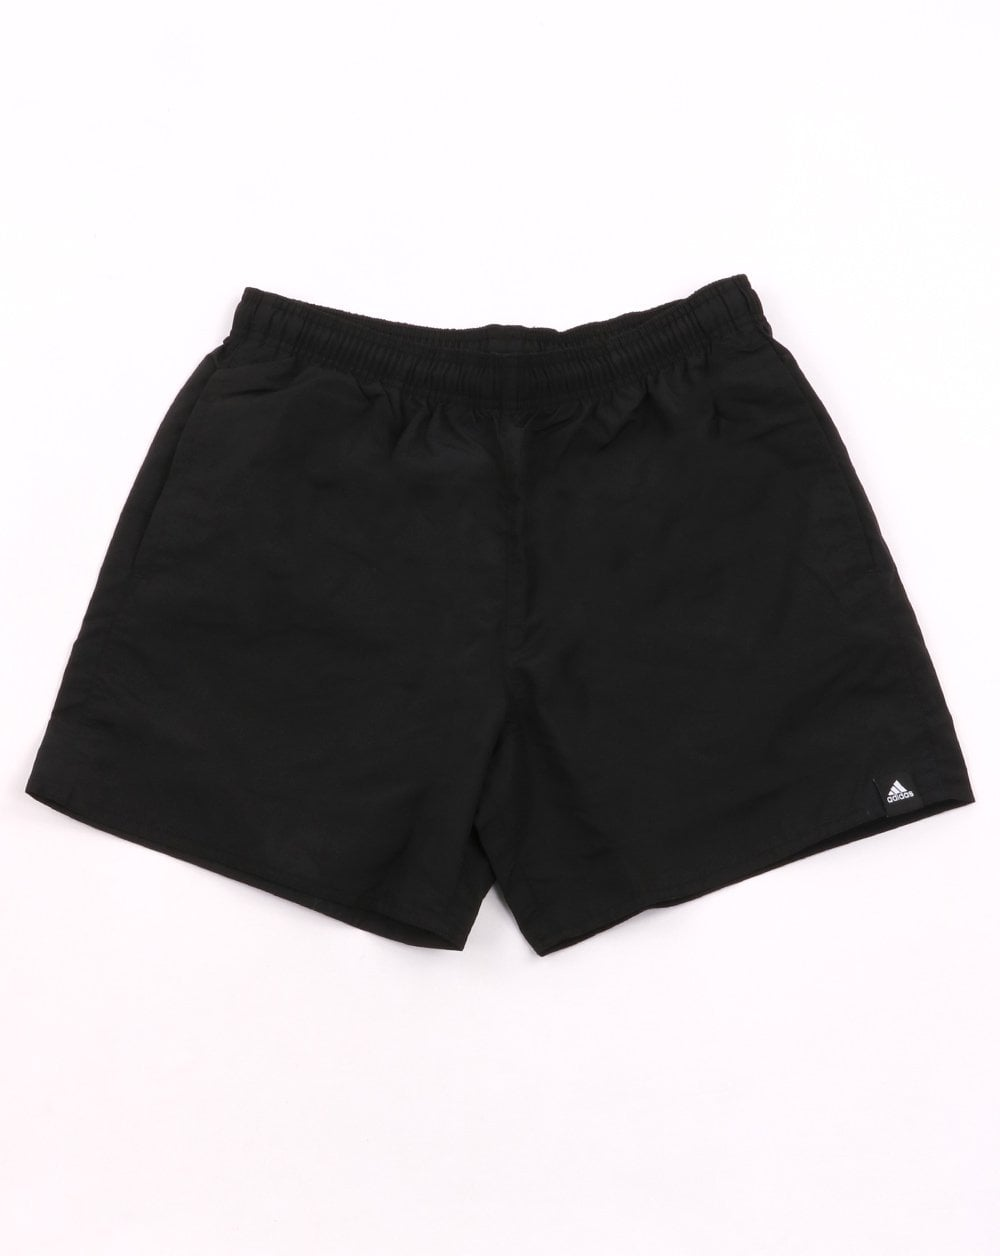 da87b51518baf adidas Originals Adidas Originals Solid Swim Shorts Black